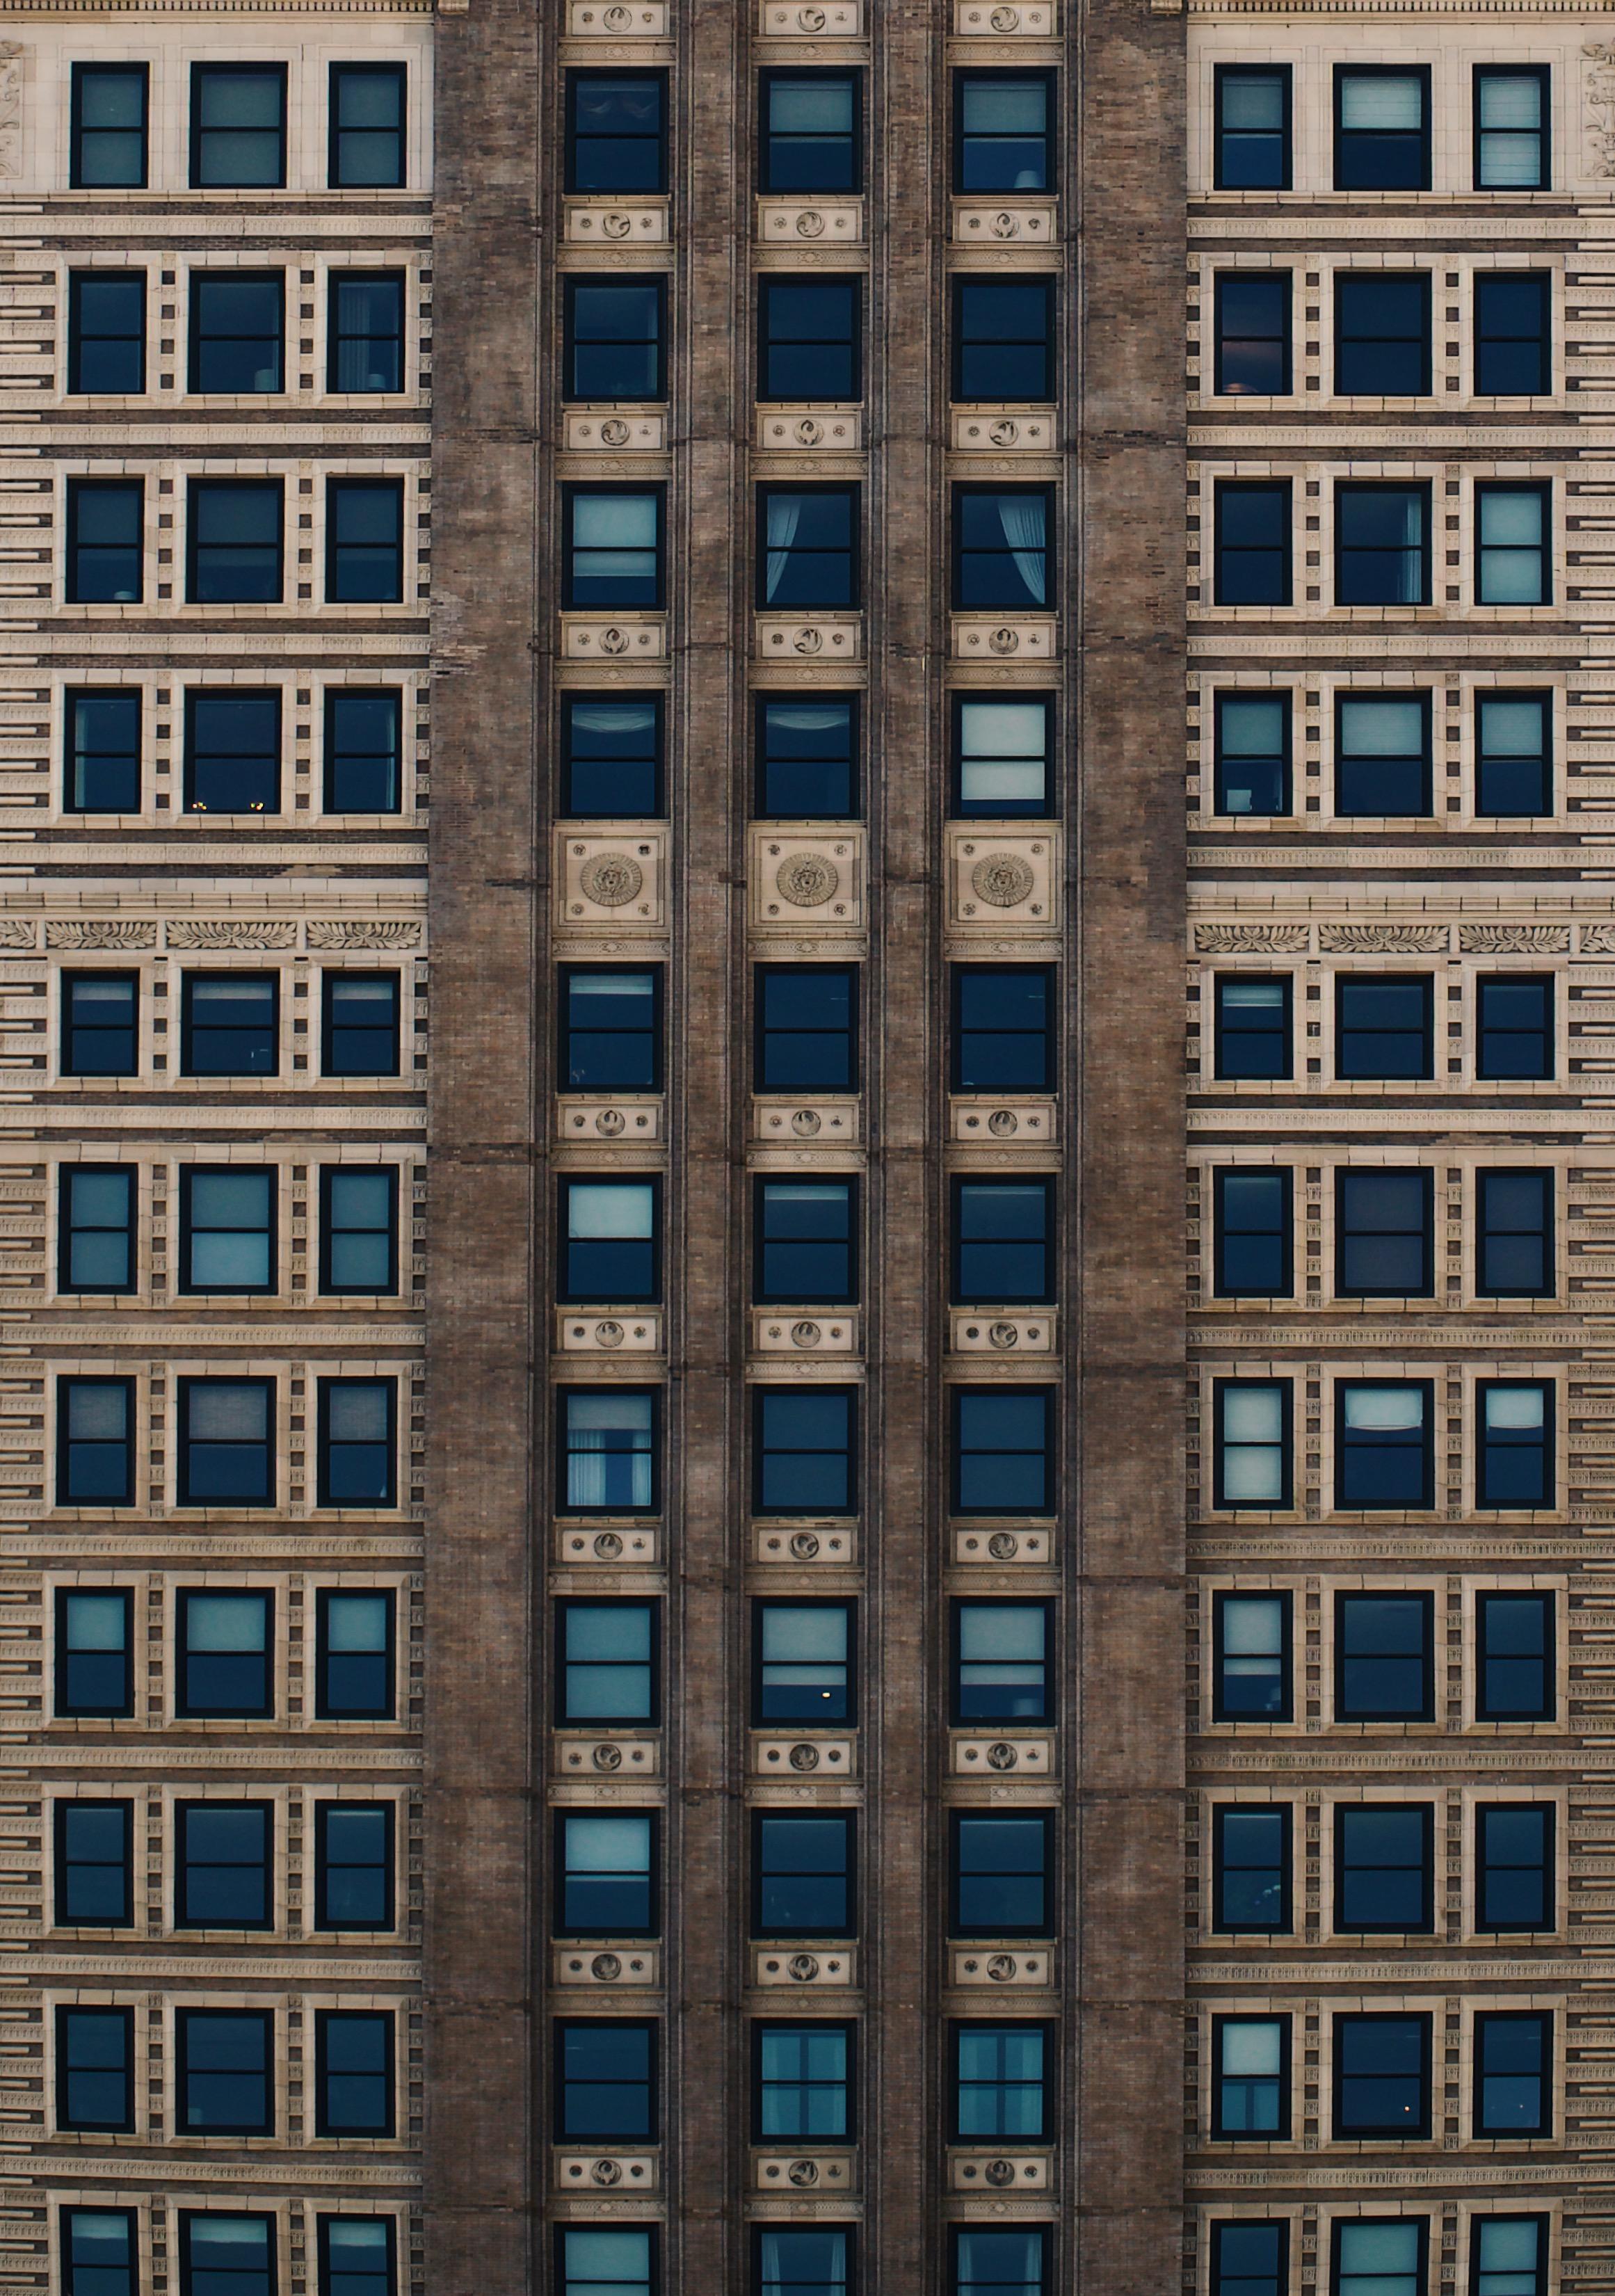 Free Images Architecture Window Building City Skyscraper